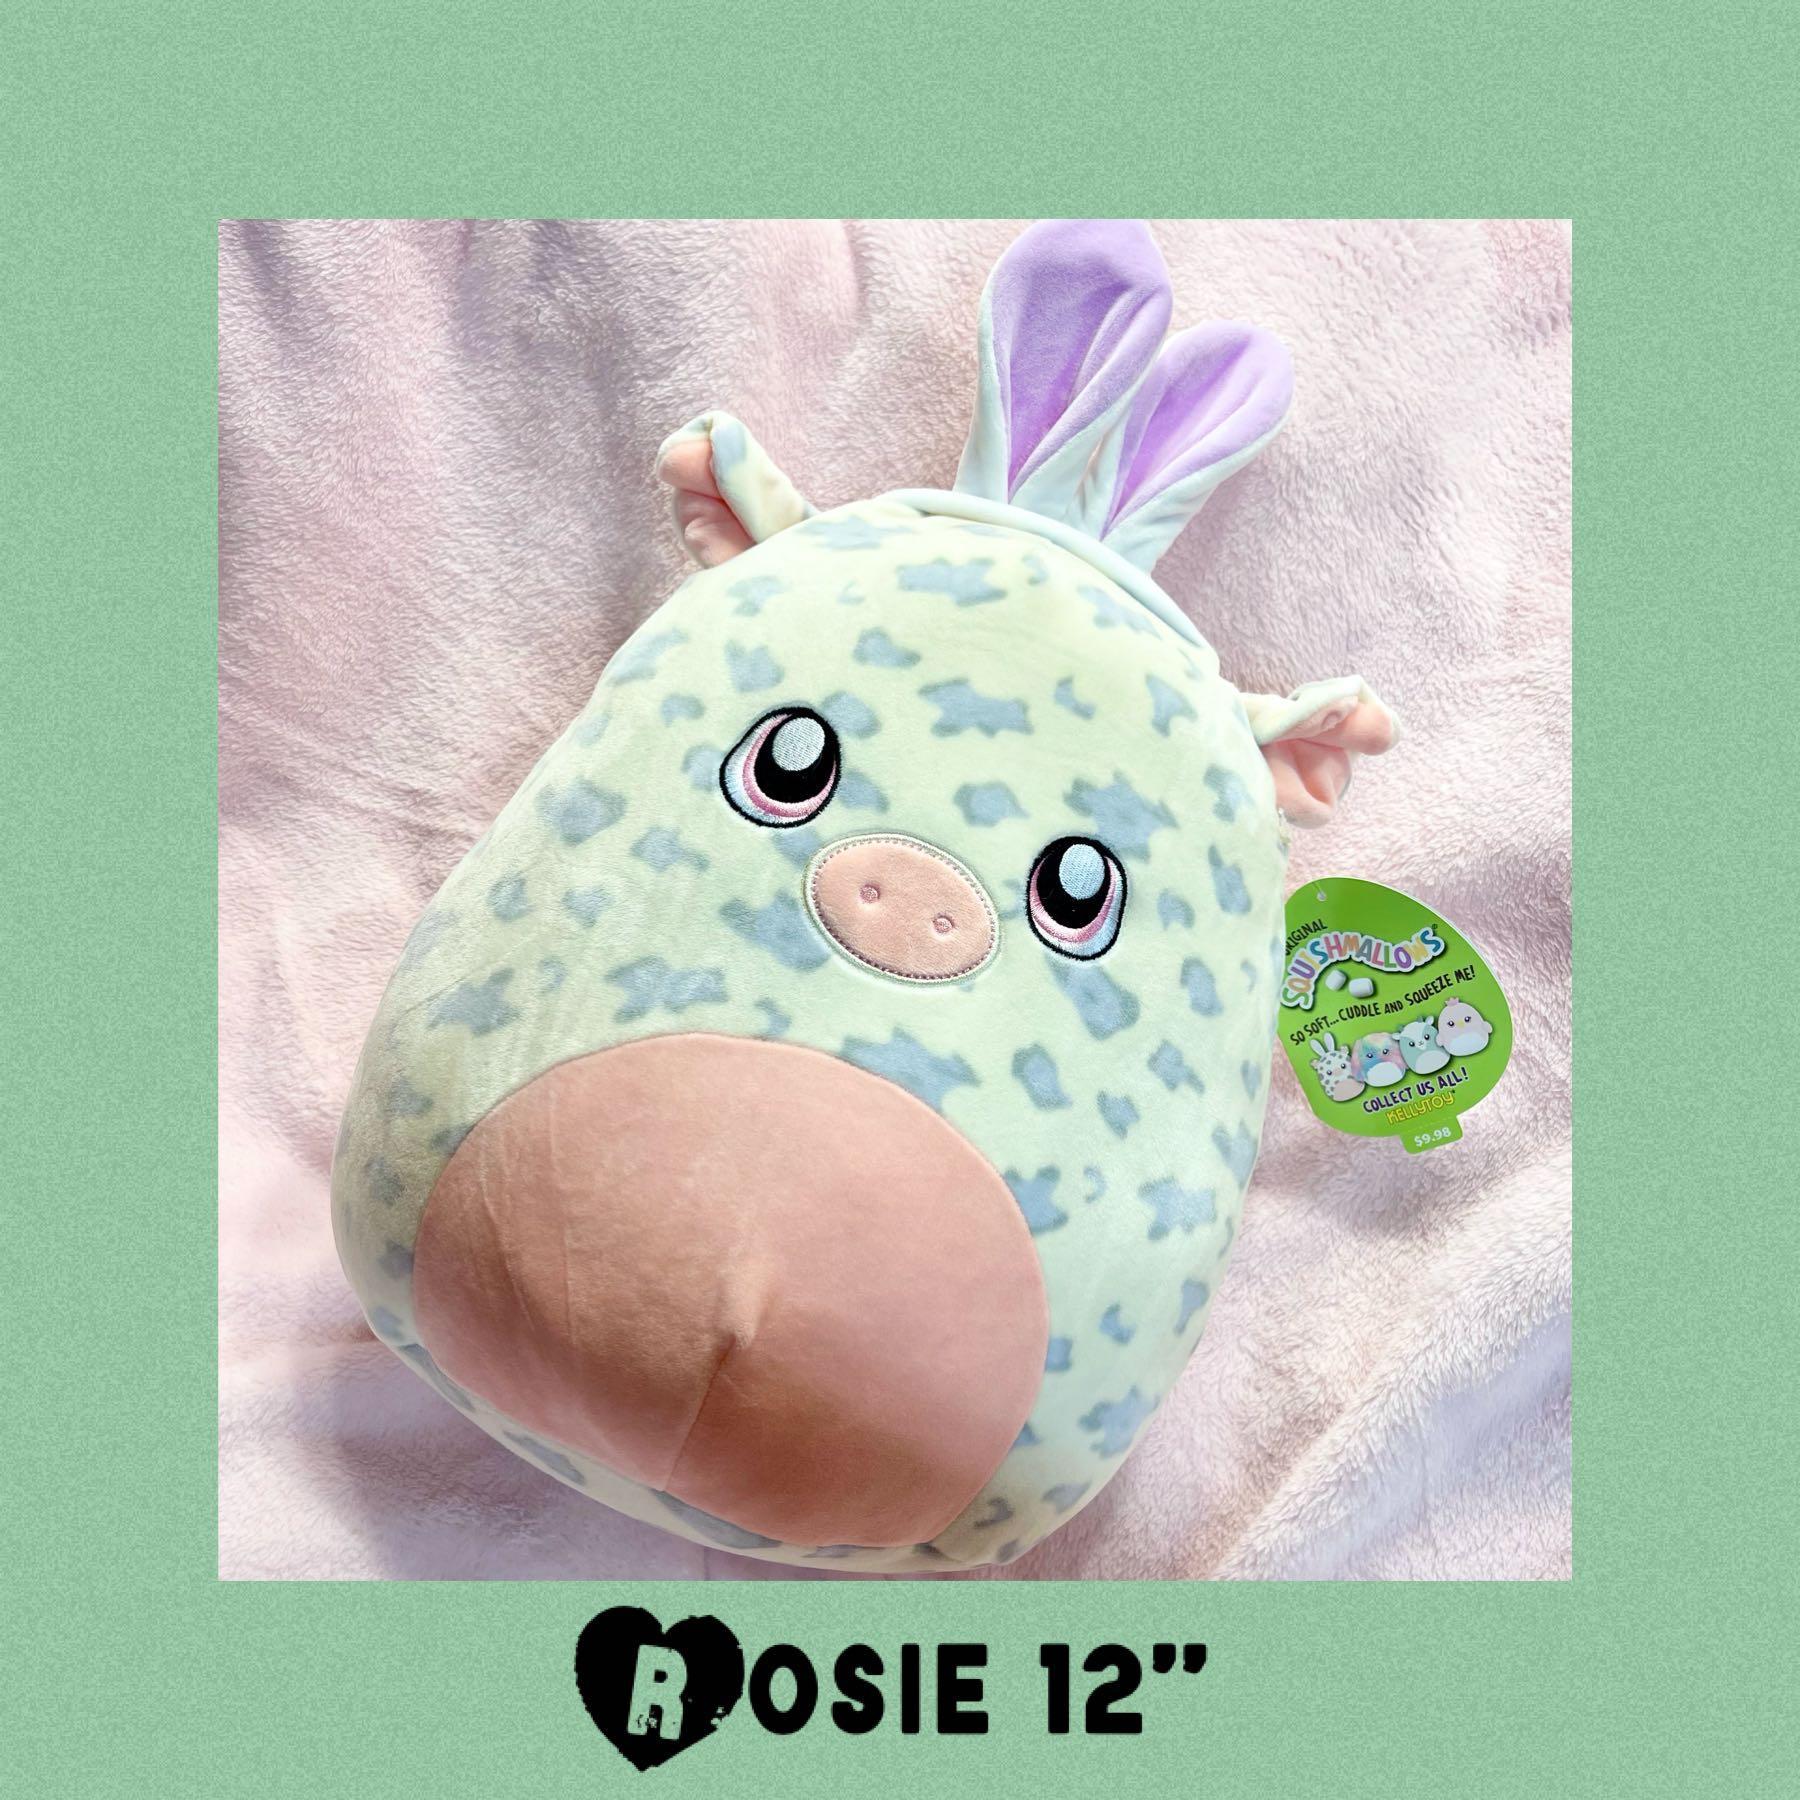 "Easter Pig Squishmallows Rosie 12"" Plush"